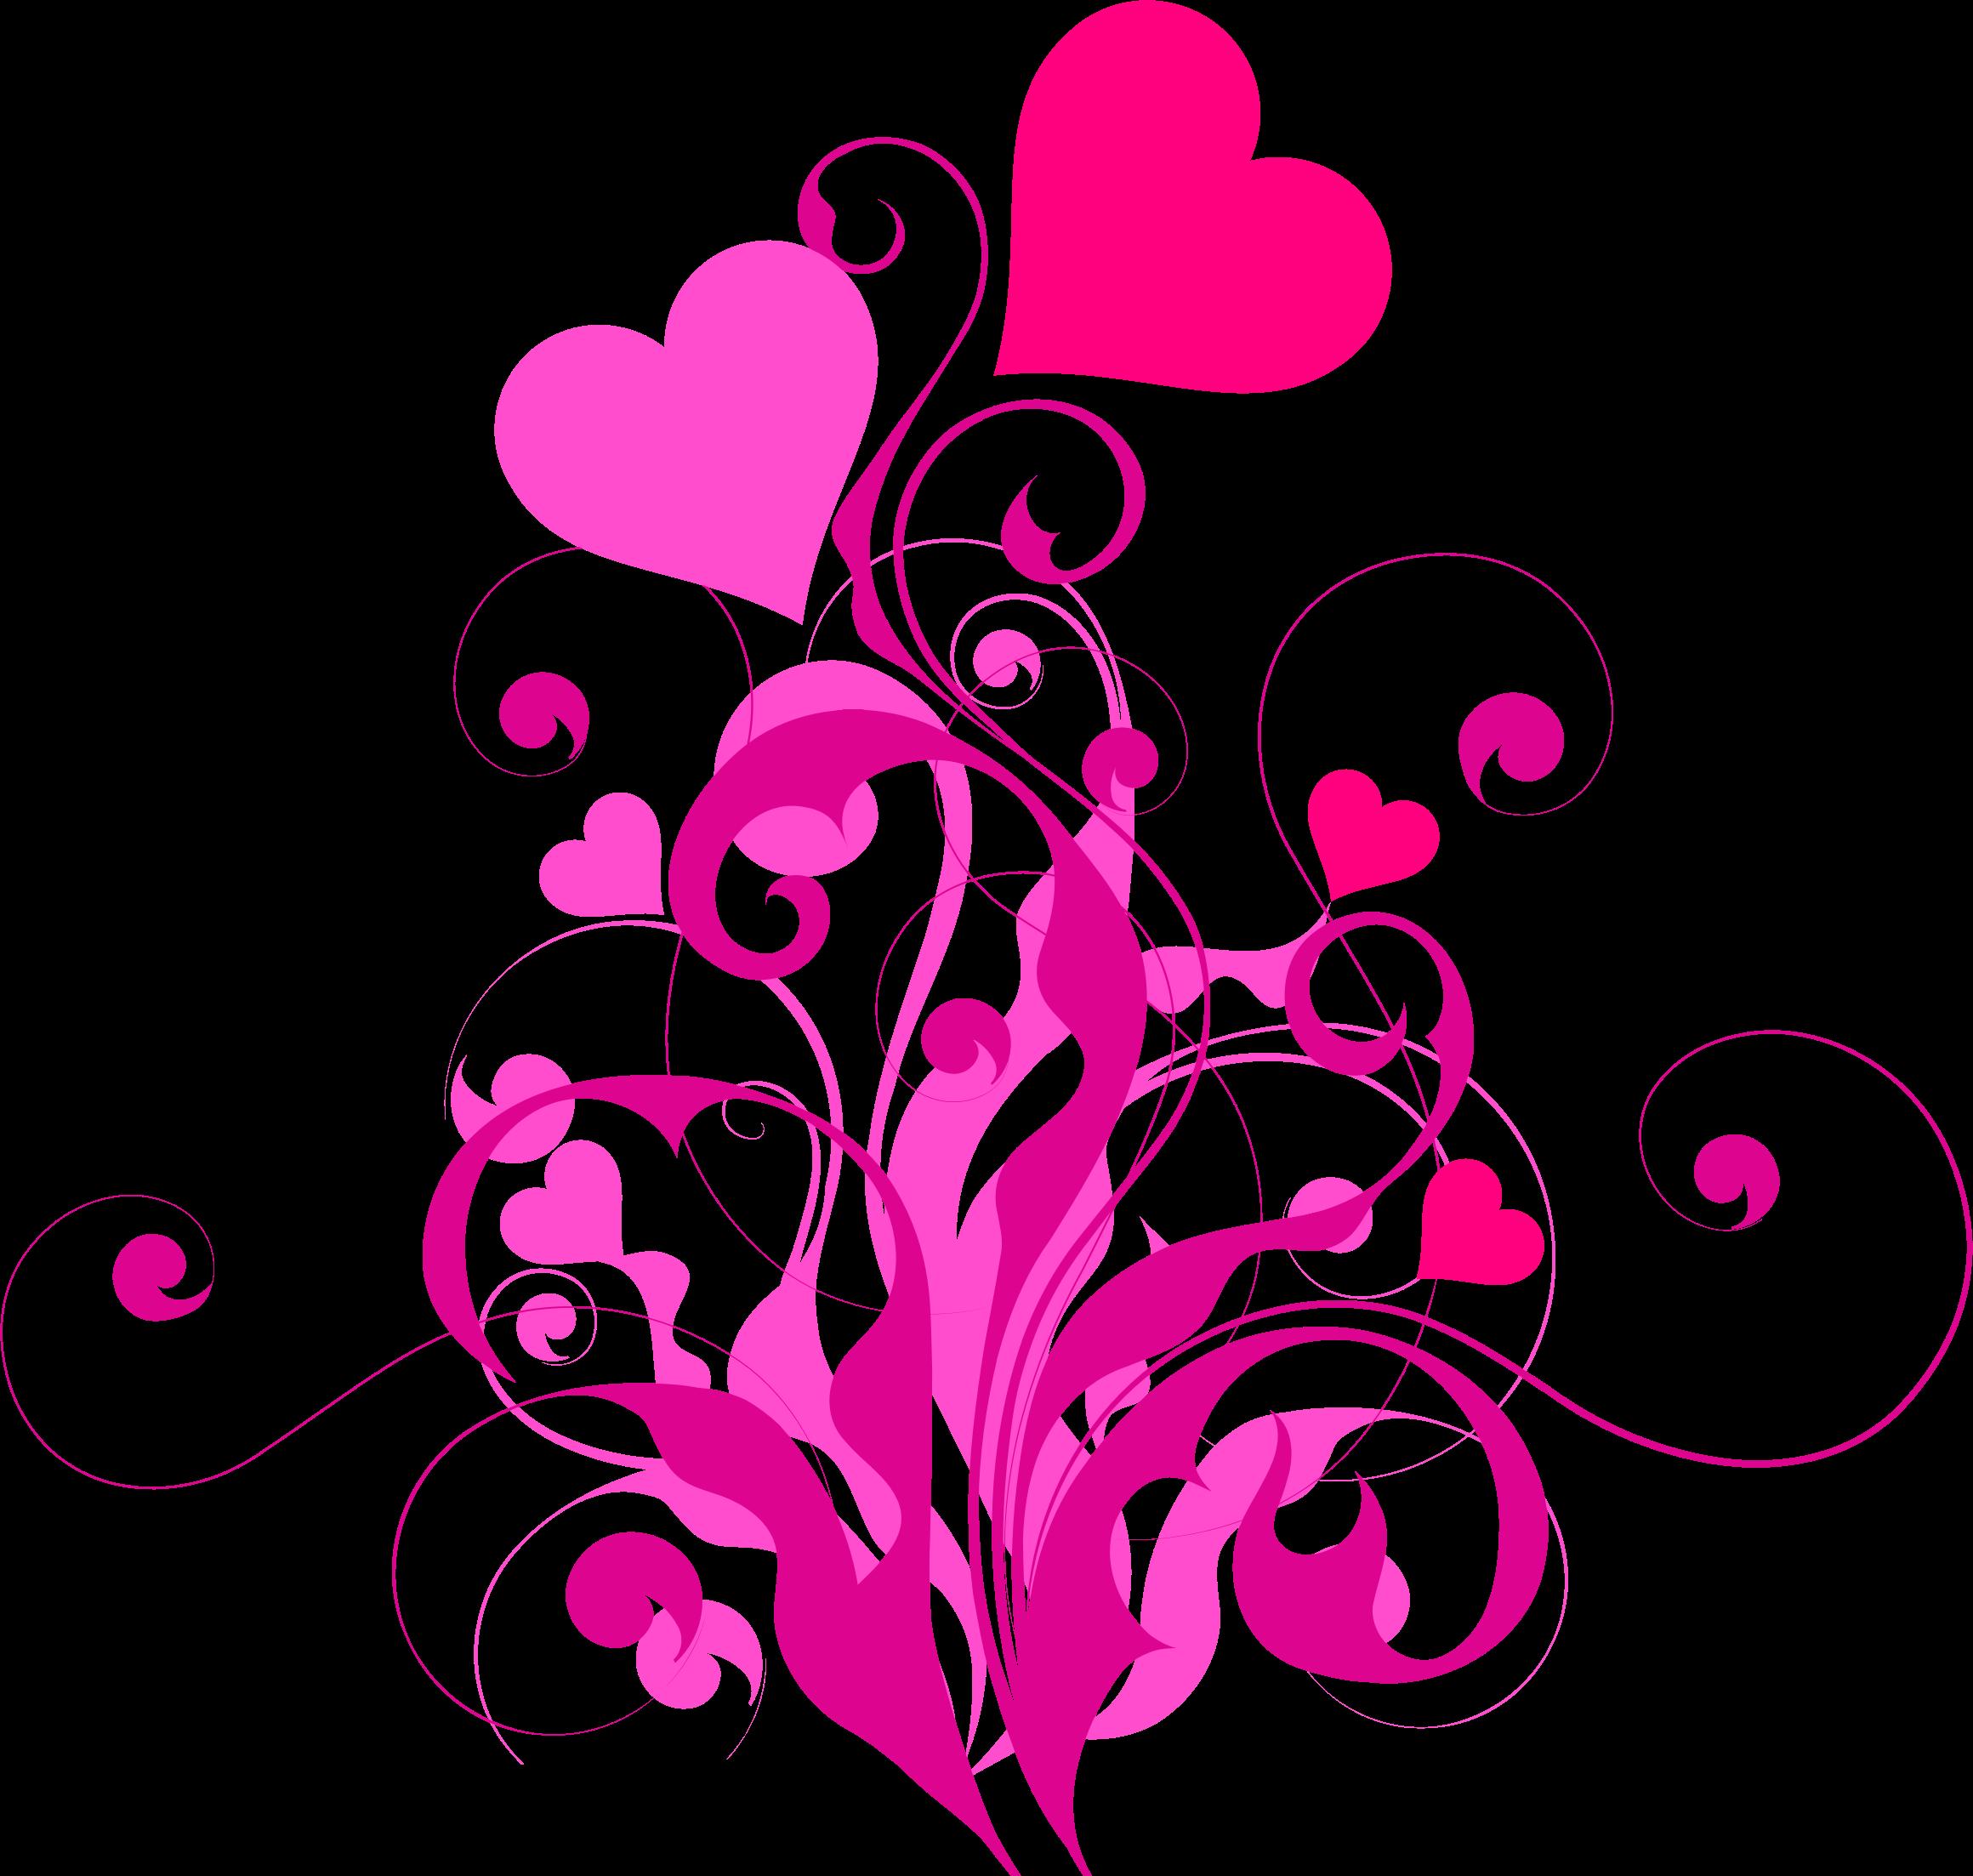 Hope clipart flower. Heart flourish big image